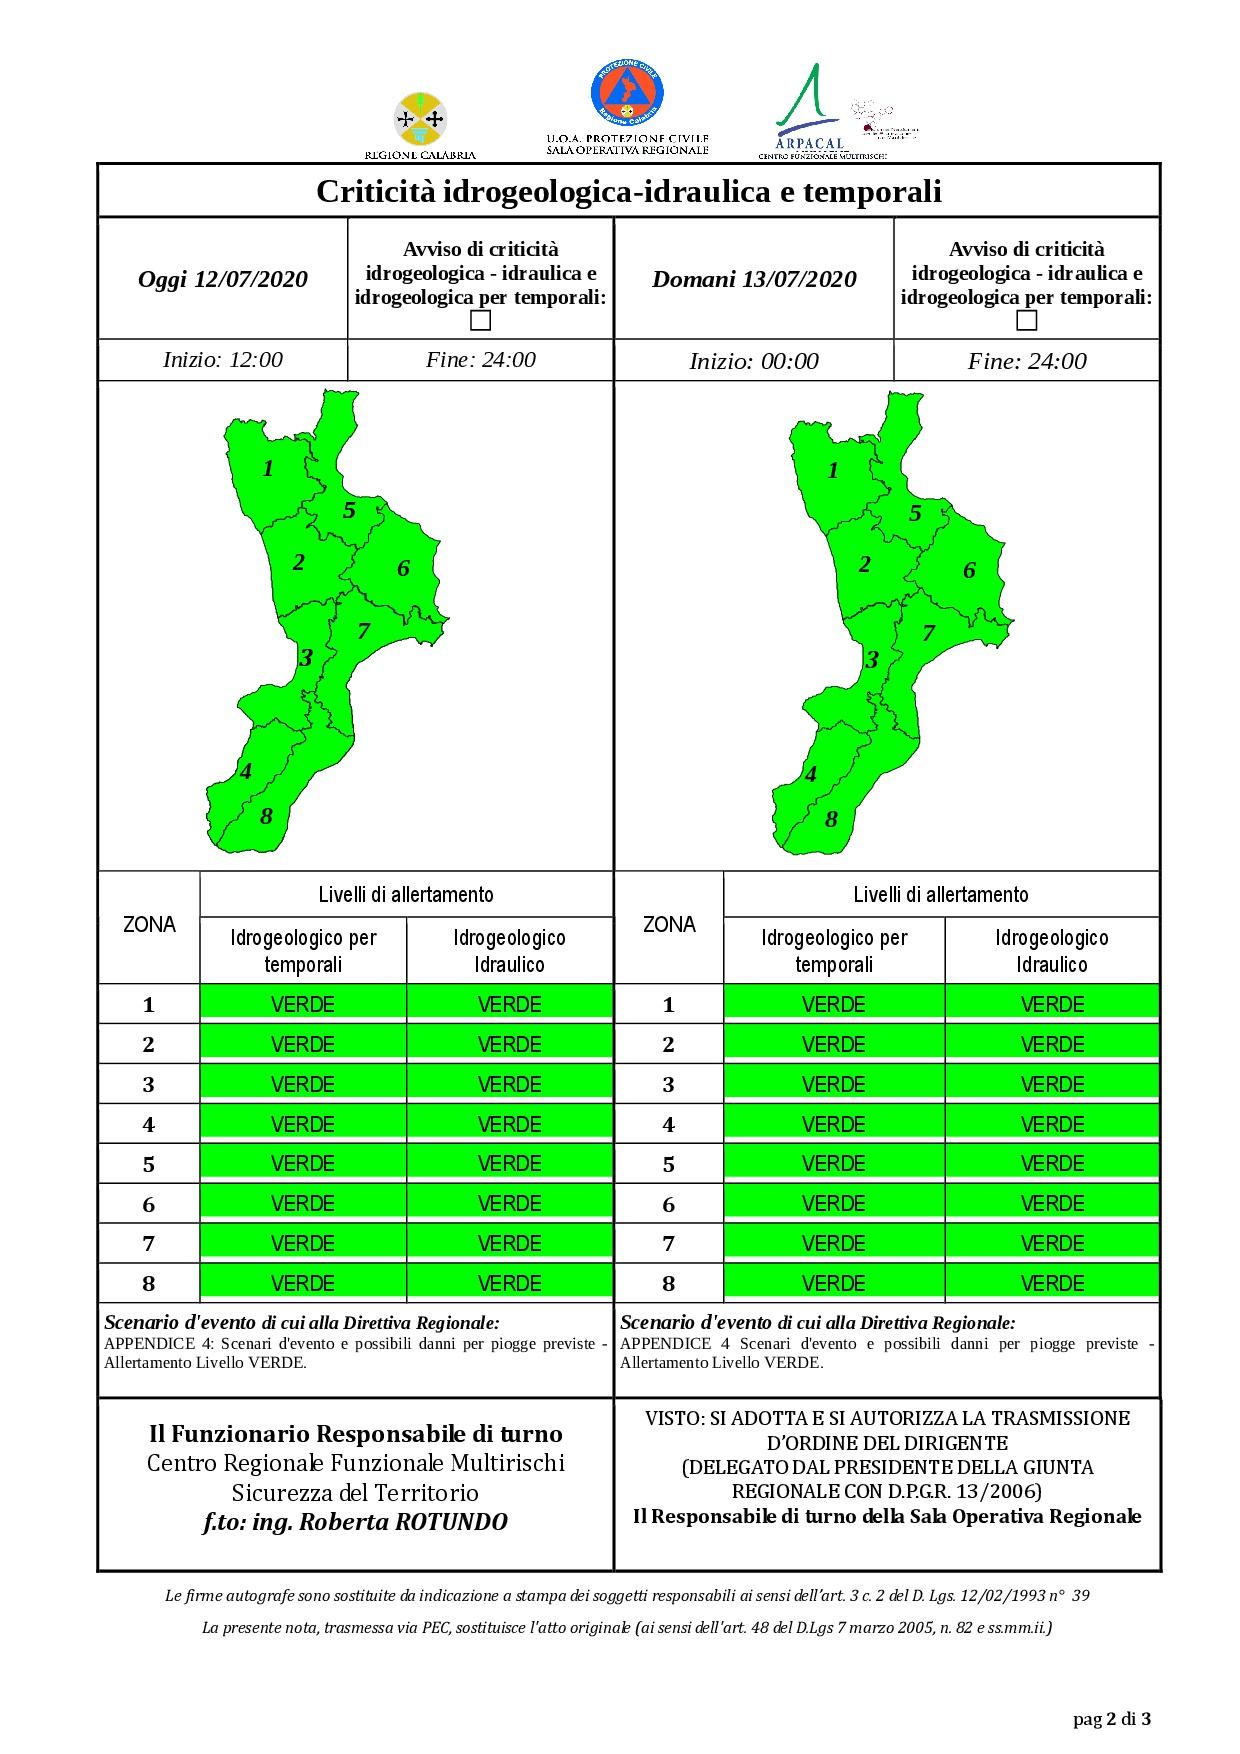 Criticità idrogeologica-idraulica e temporali in Calabria 12-07-2020